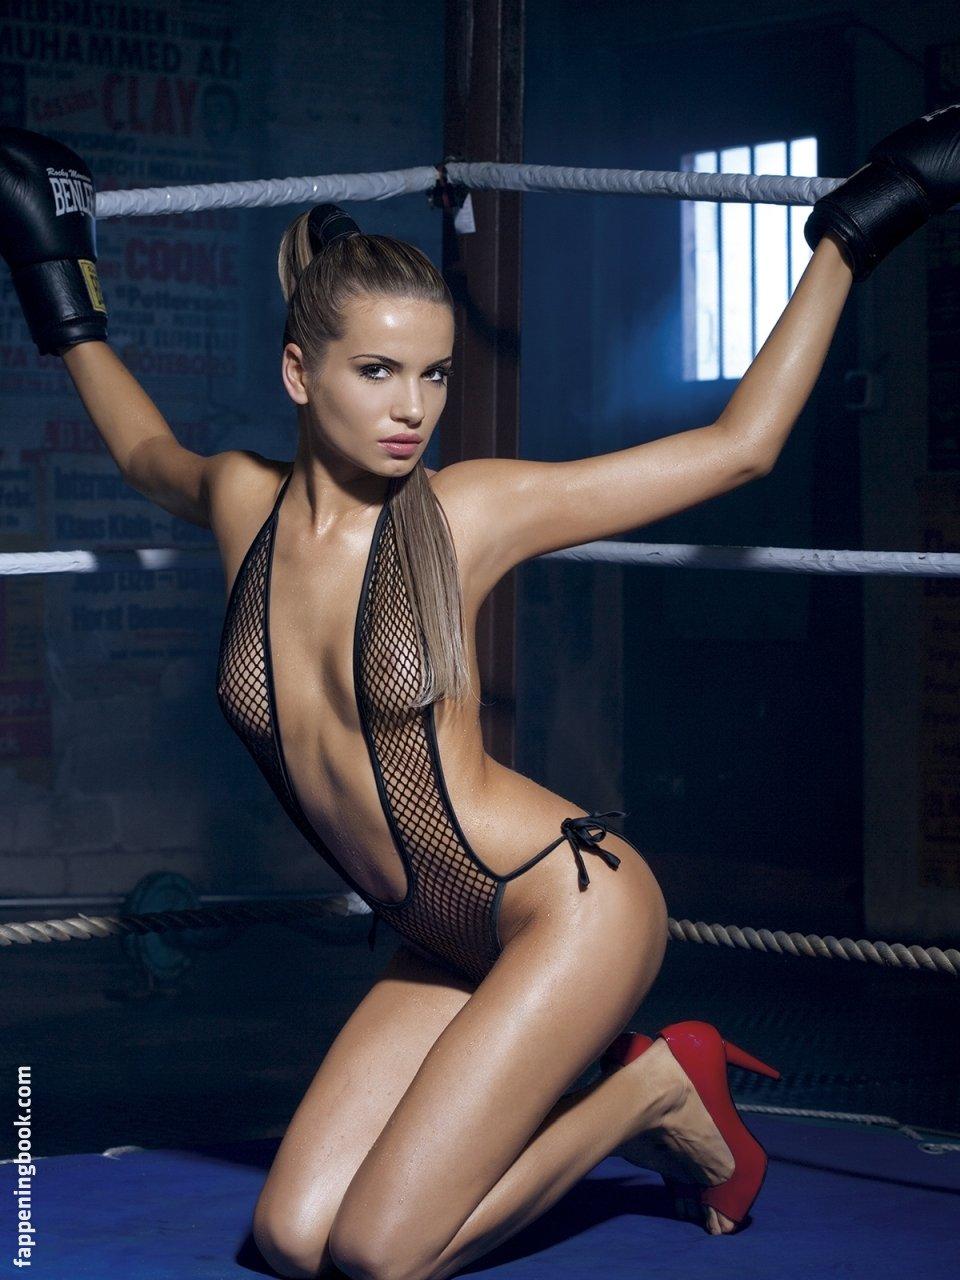 Nackt  Isabella Syrek Shooting: Nackte